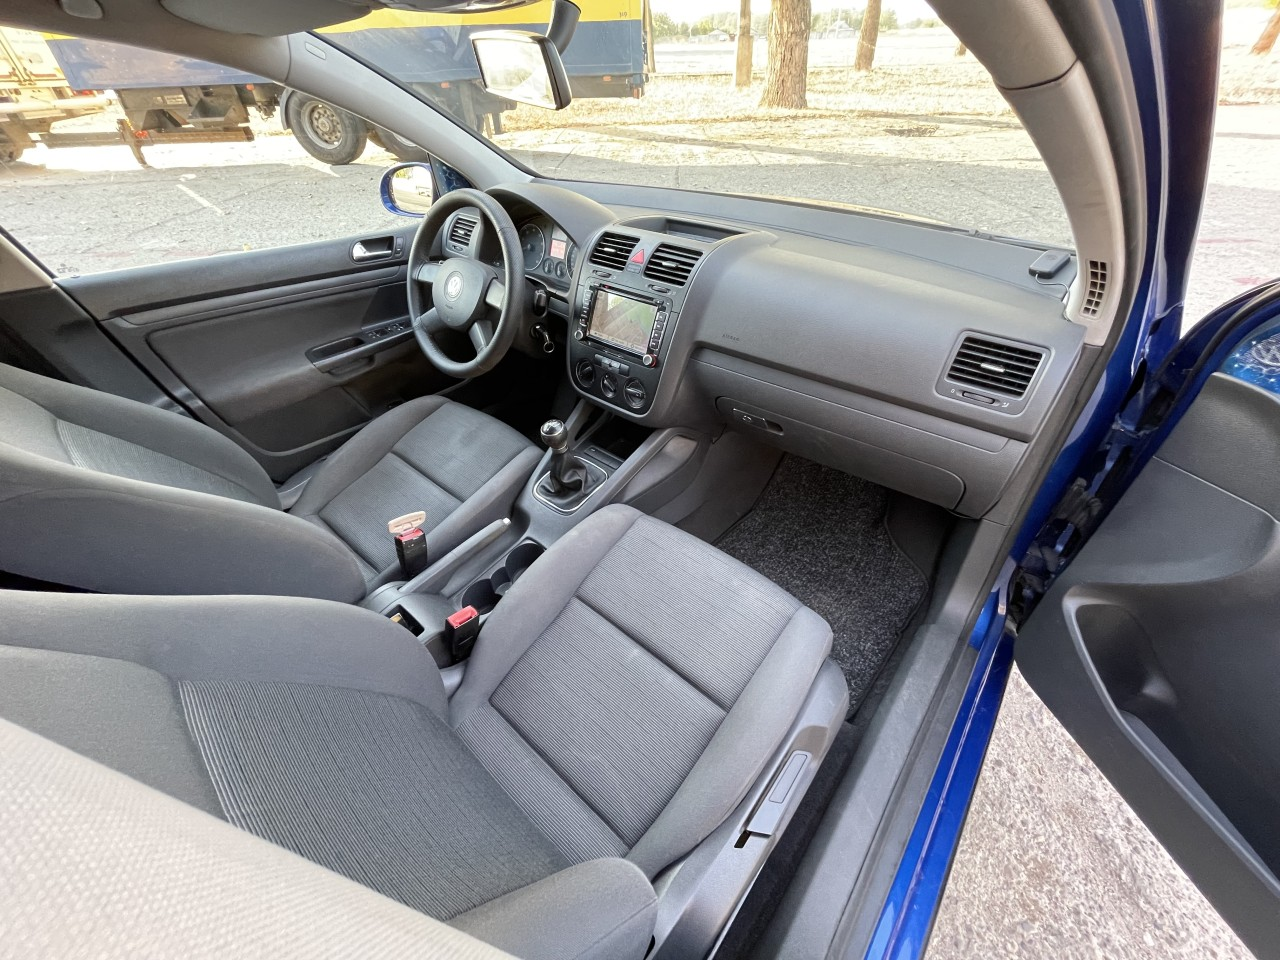 VW Golf 1.4 Benzina 2006